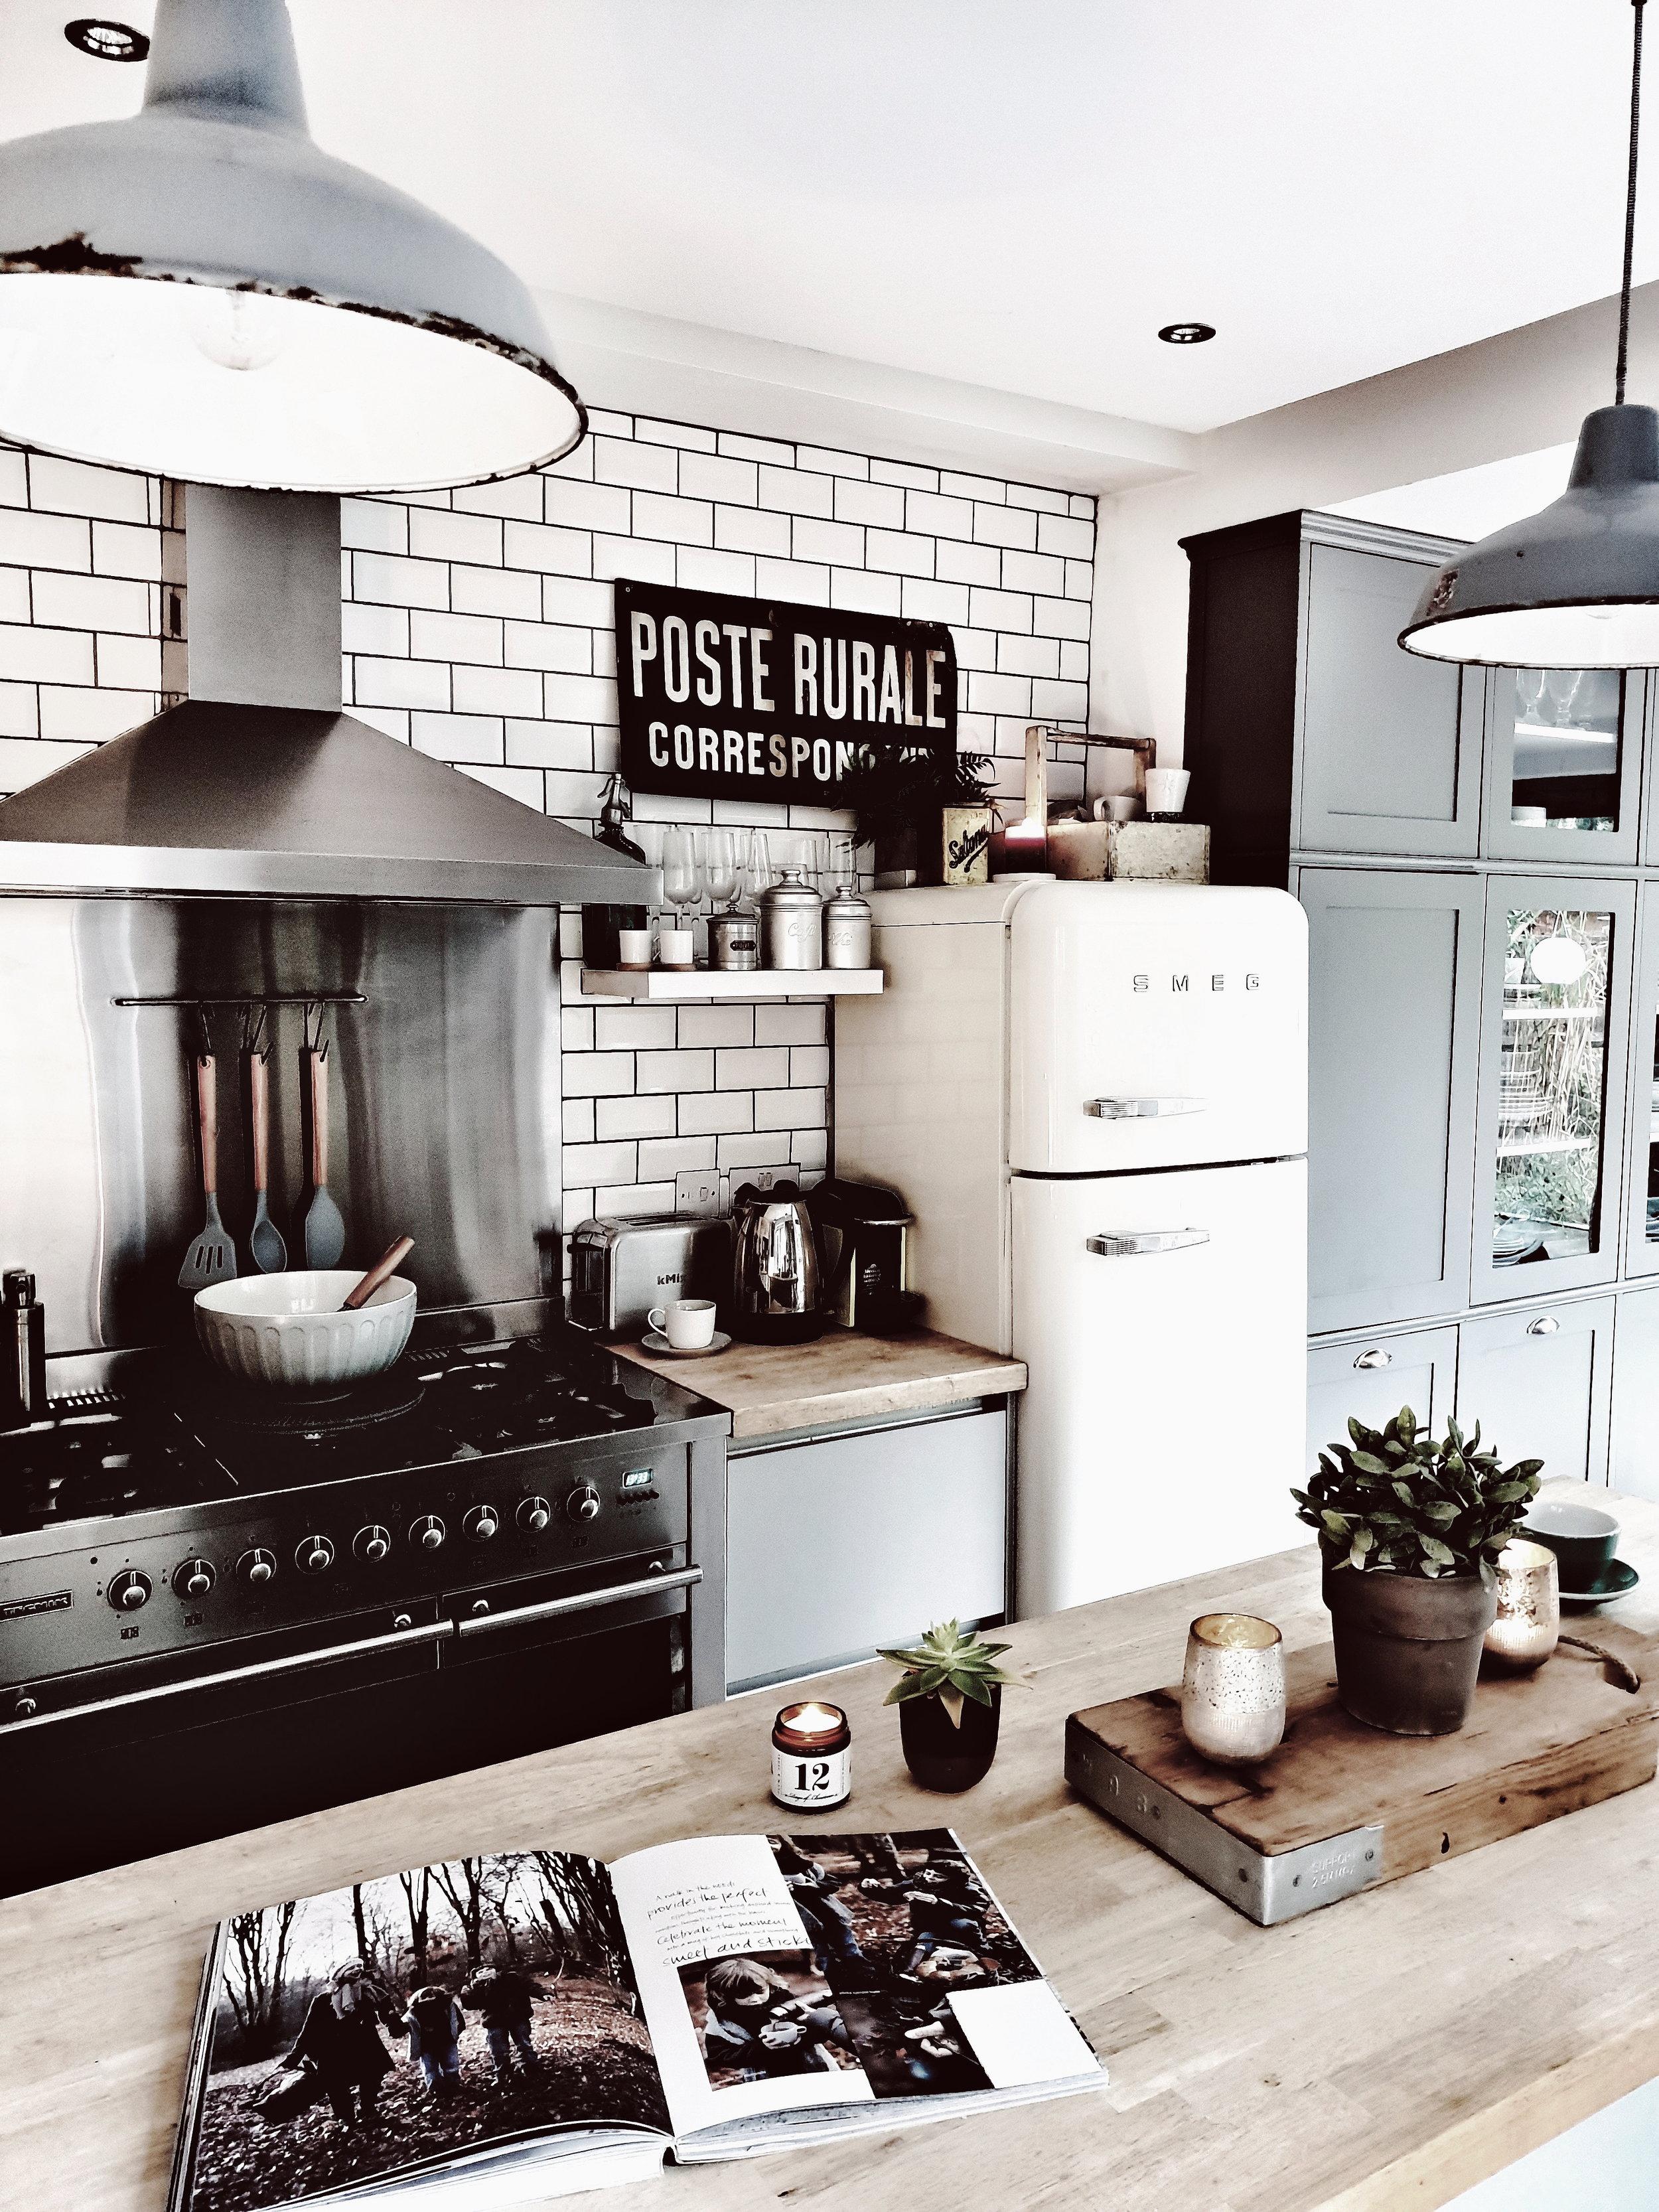 My kitchen in October